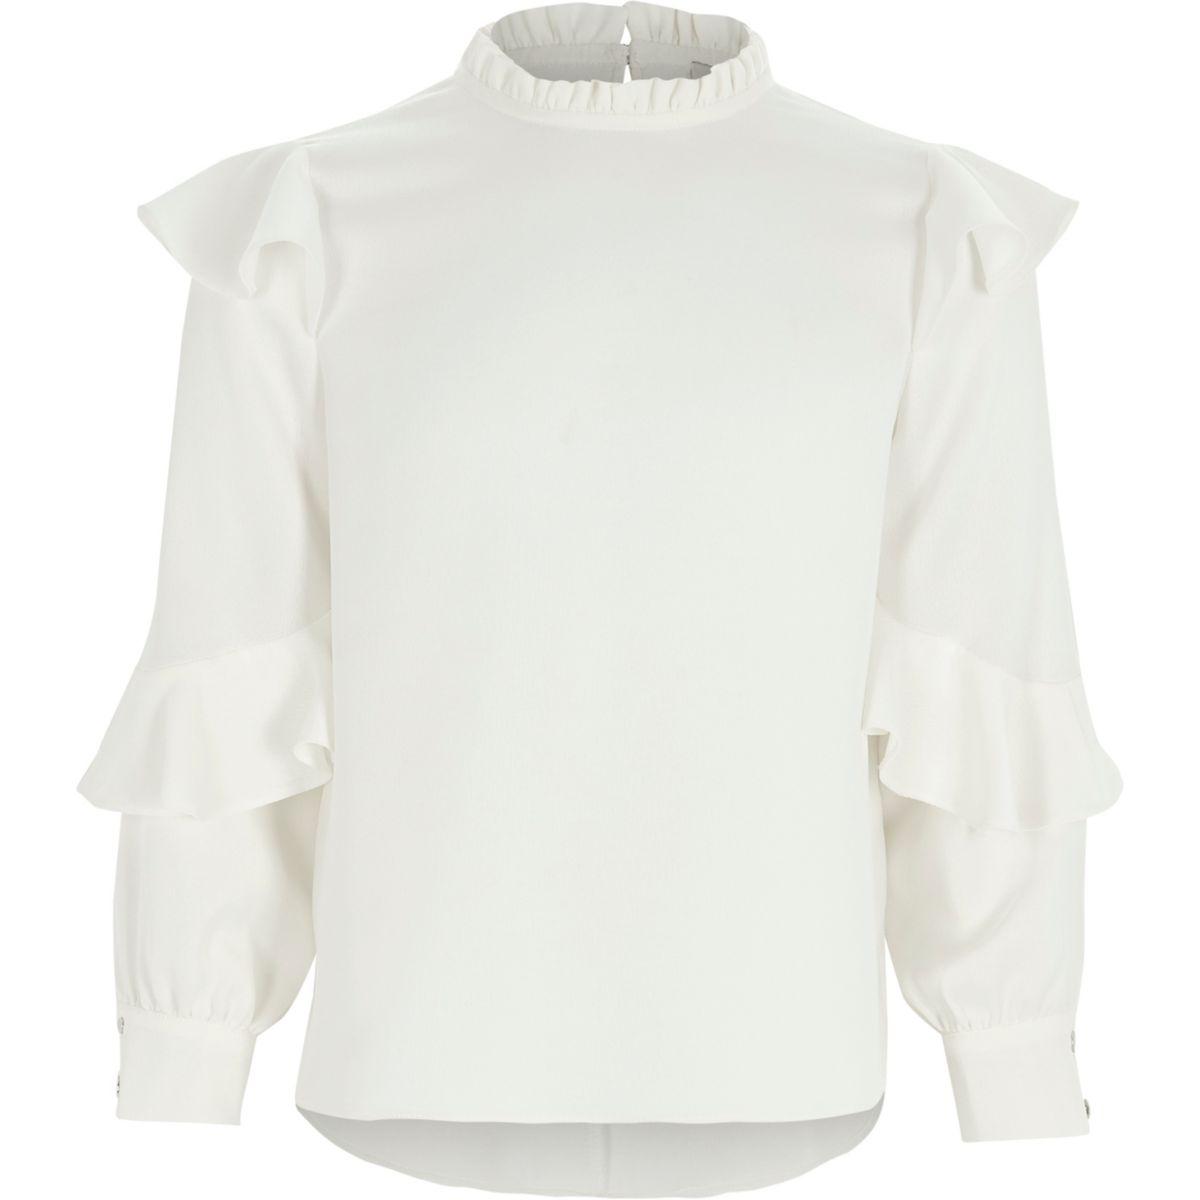 Girls cream frill sleeve ruffle high neck top